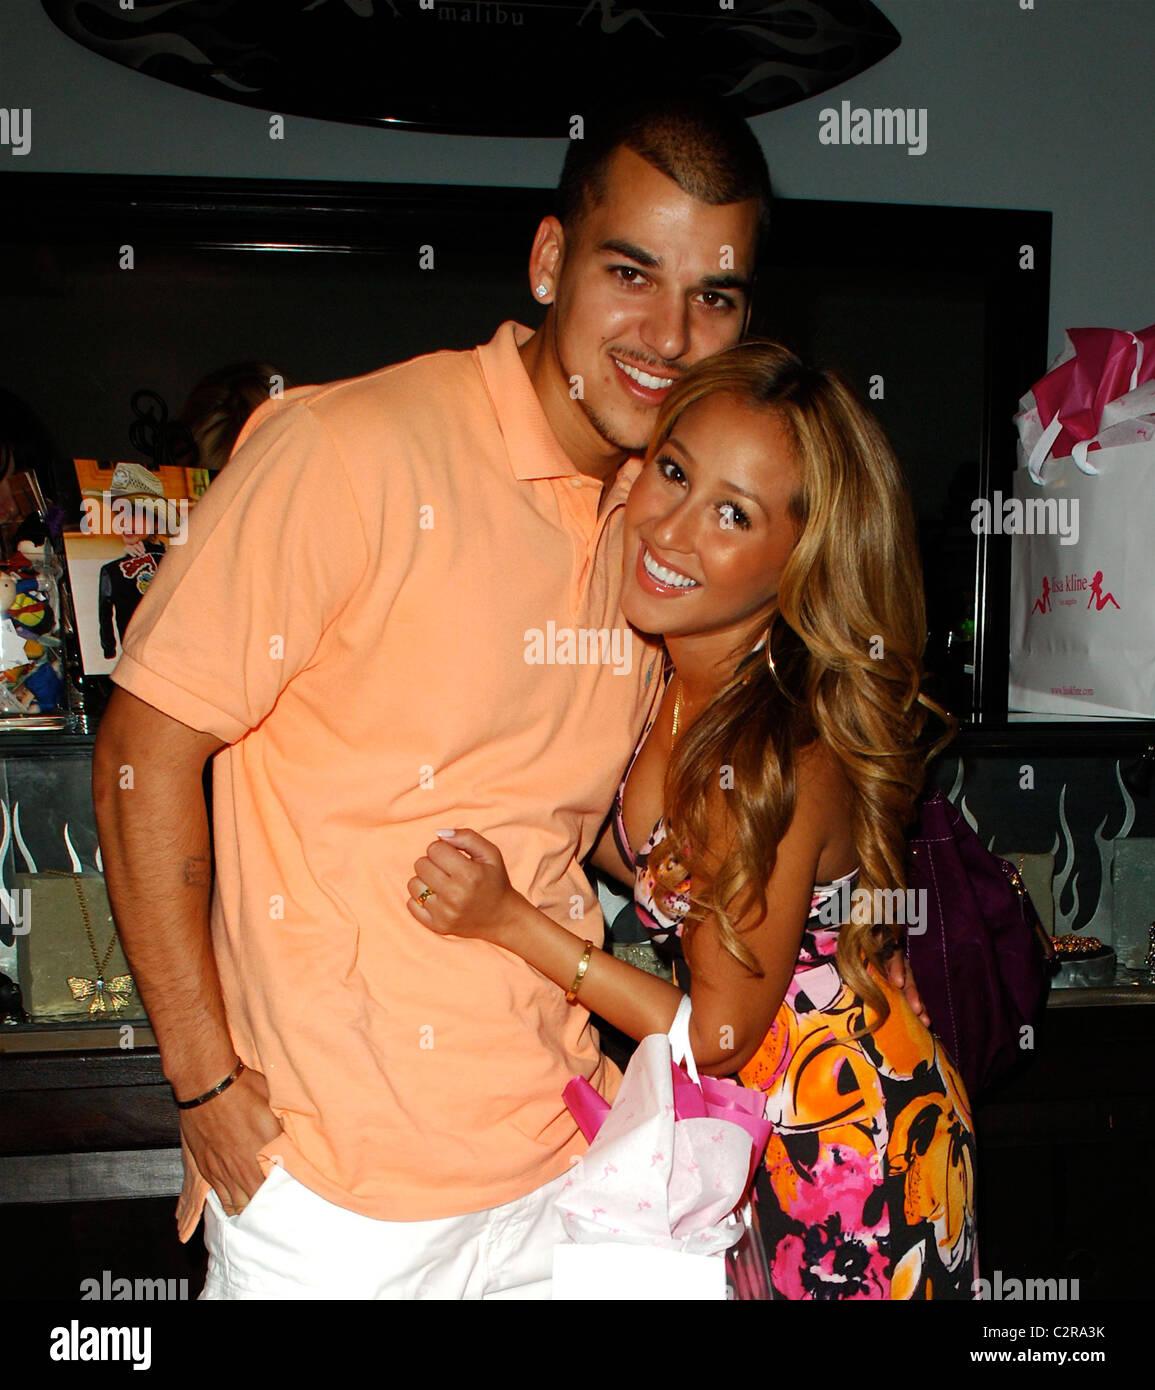 Is rob kardashian still dating the cheetah girl